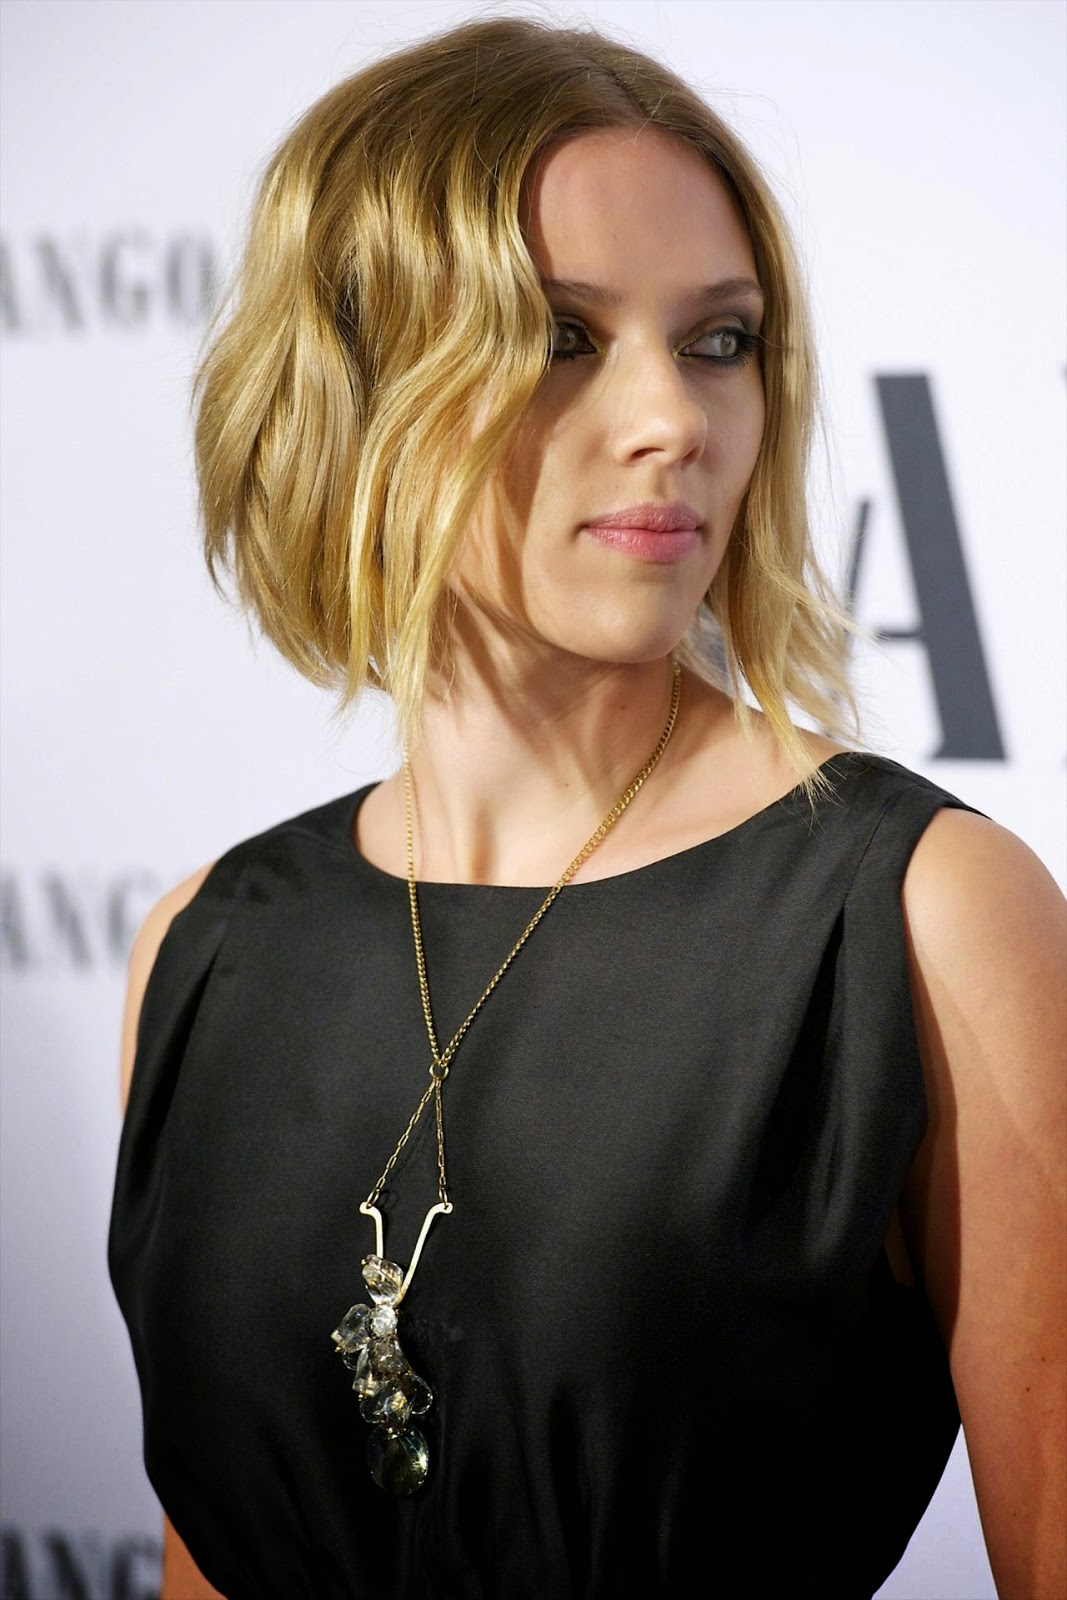 Scarlett Johansson Hairstyle Part2 12 Styling Fshs